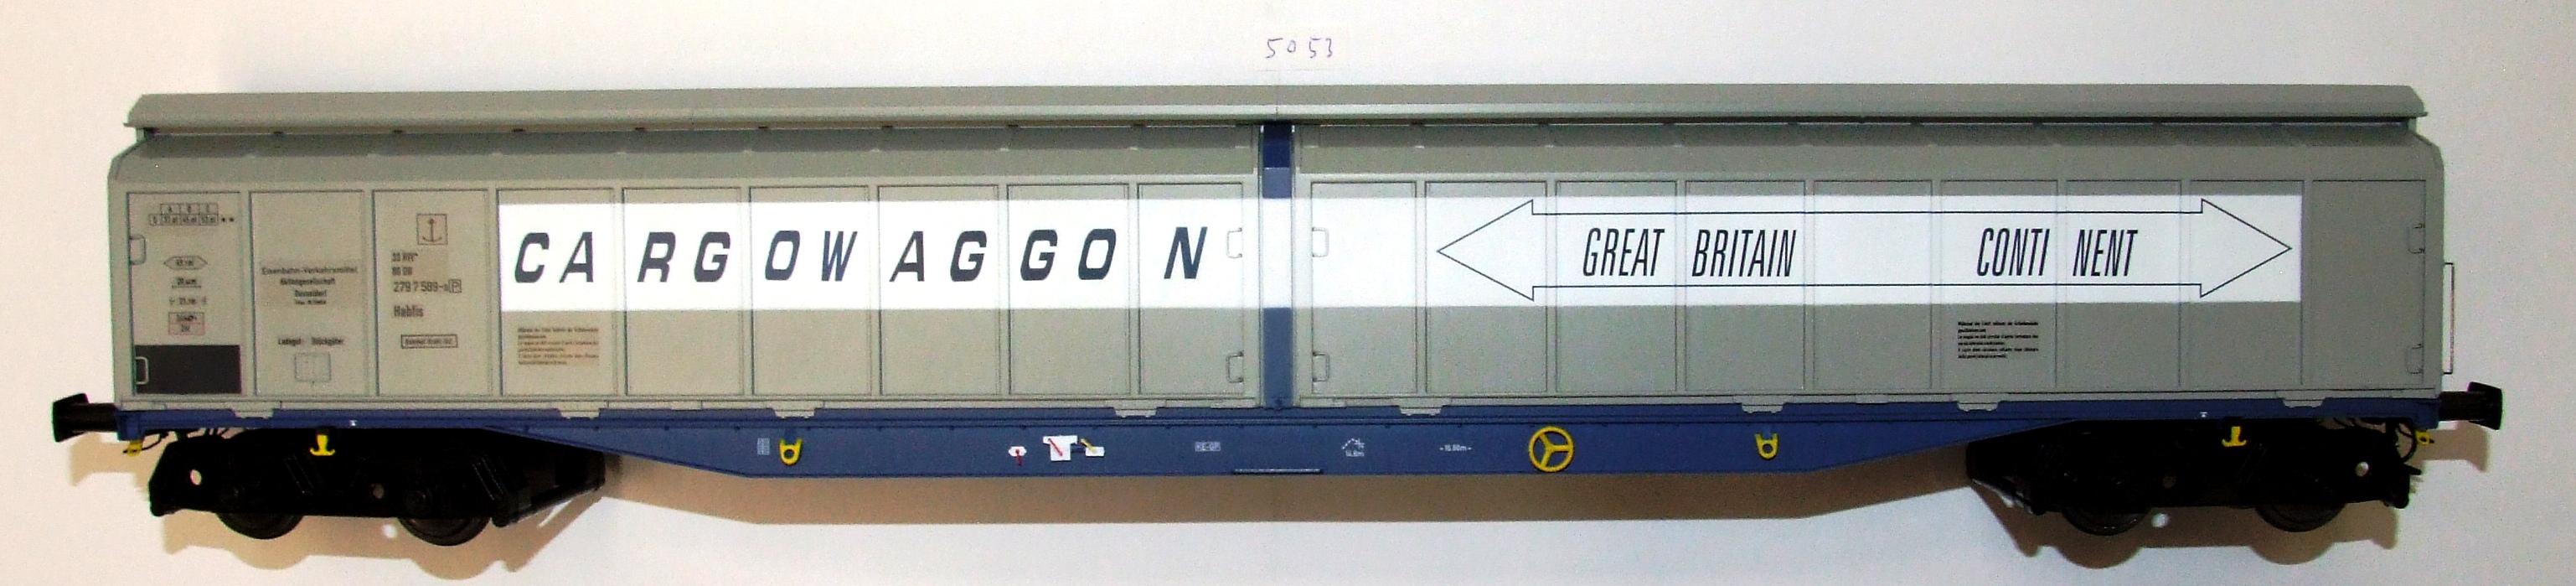 5053 Heljan Spur 0 Güterwagen Habfis H2 DB EP IV/V GB Conti